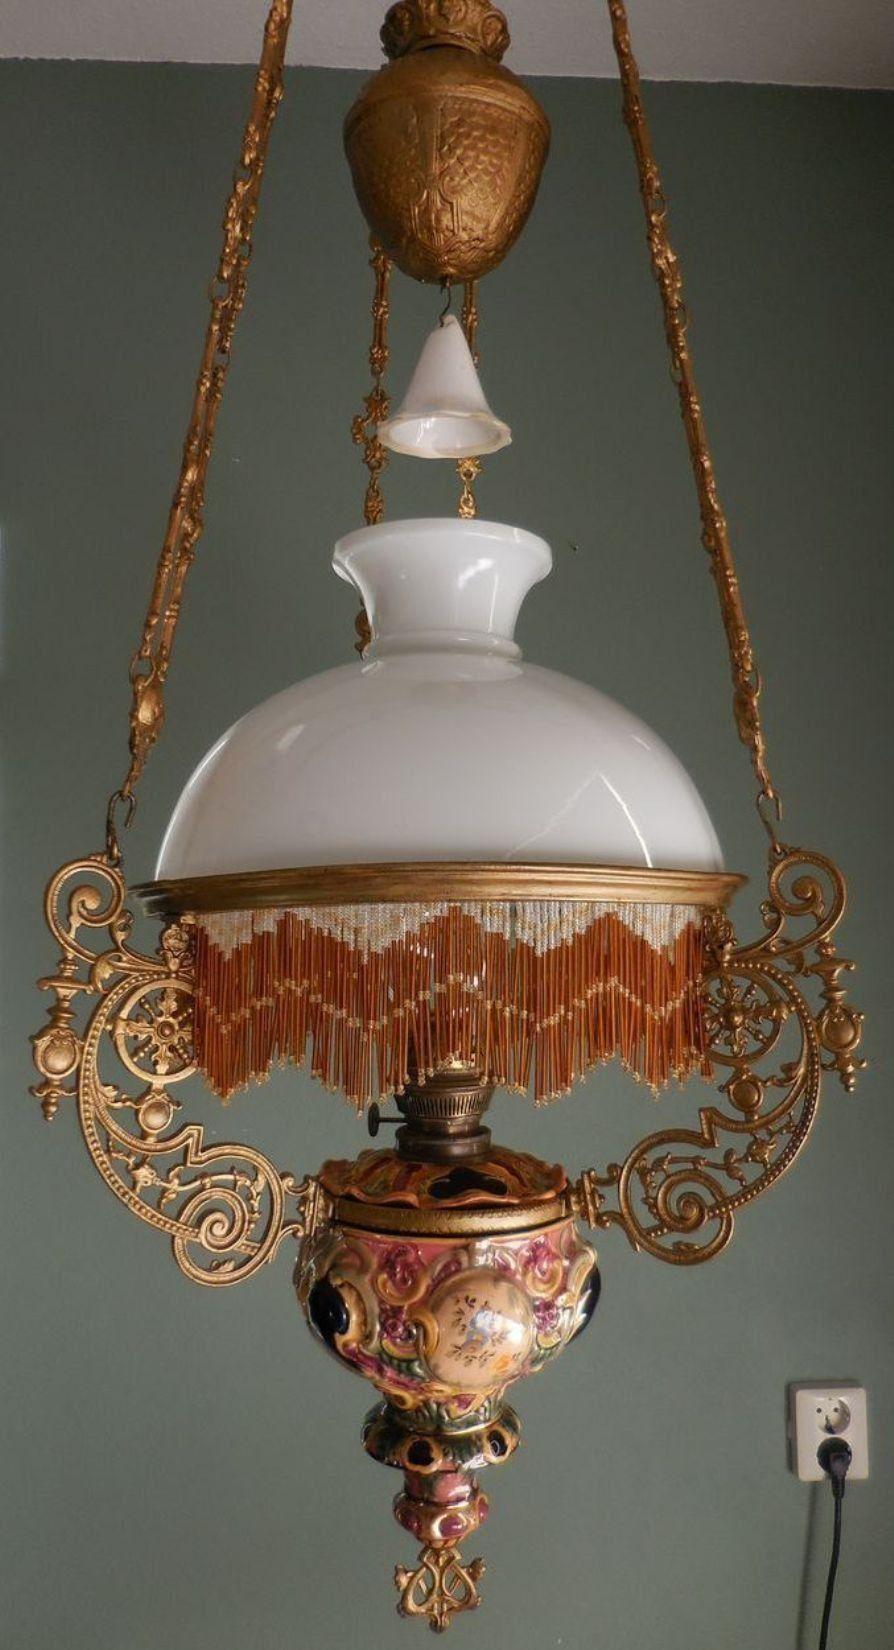 Timeless And Charming Antique Lighting Fixtures Antieke Lampen Olielamp Lampen